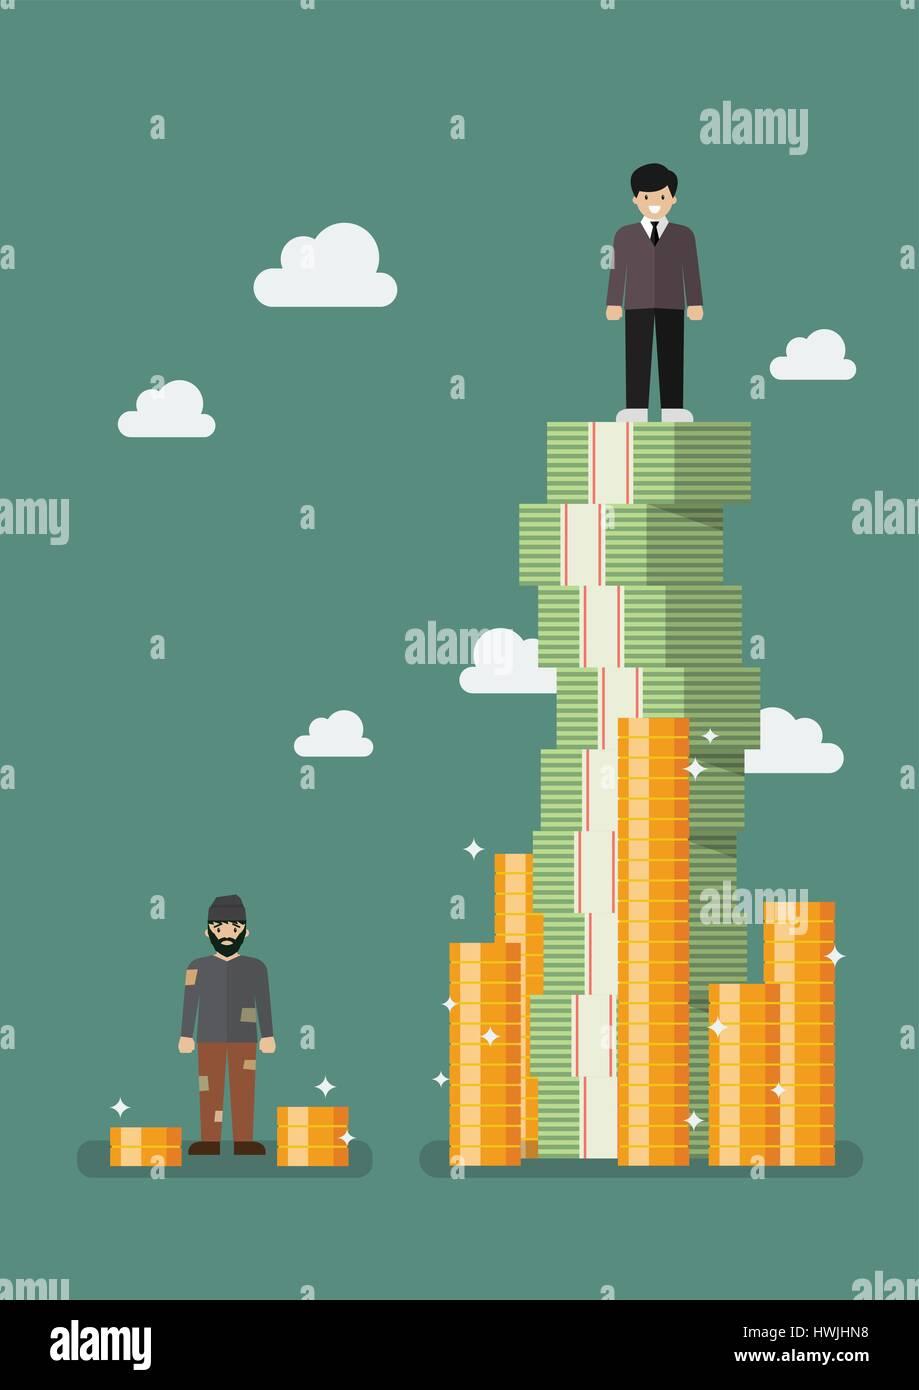 Gap between rich and poor Vector illustration Stock